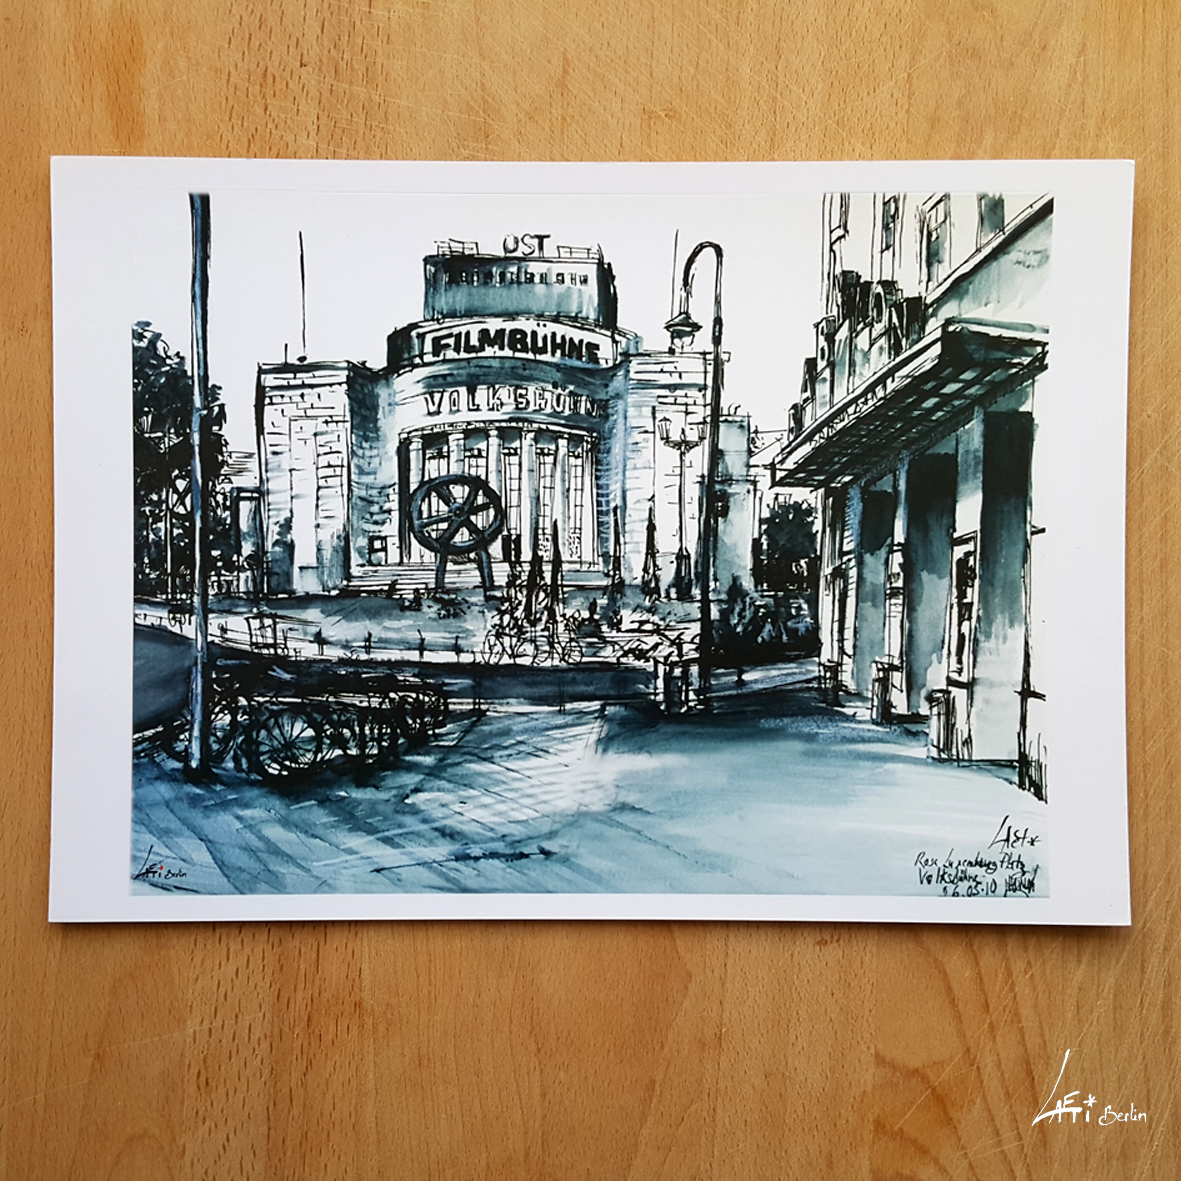 Volksbühne-poster-A4-urbansketche-Berlin-print-signed-limited